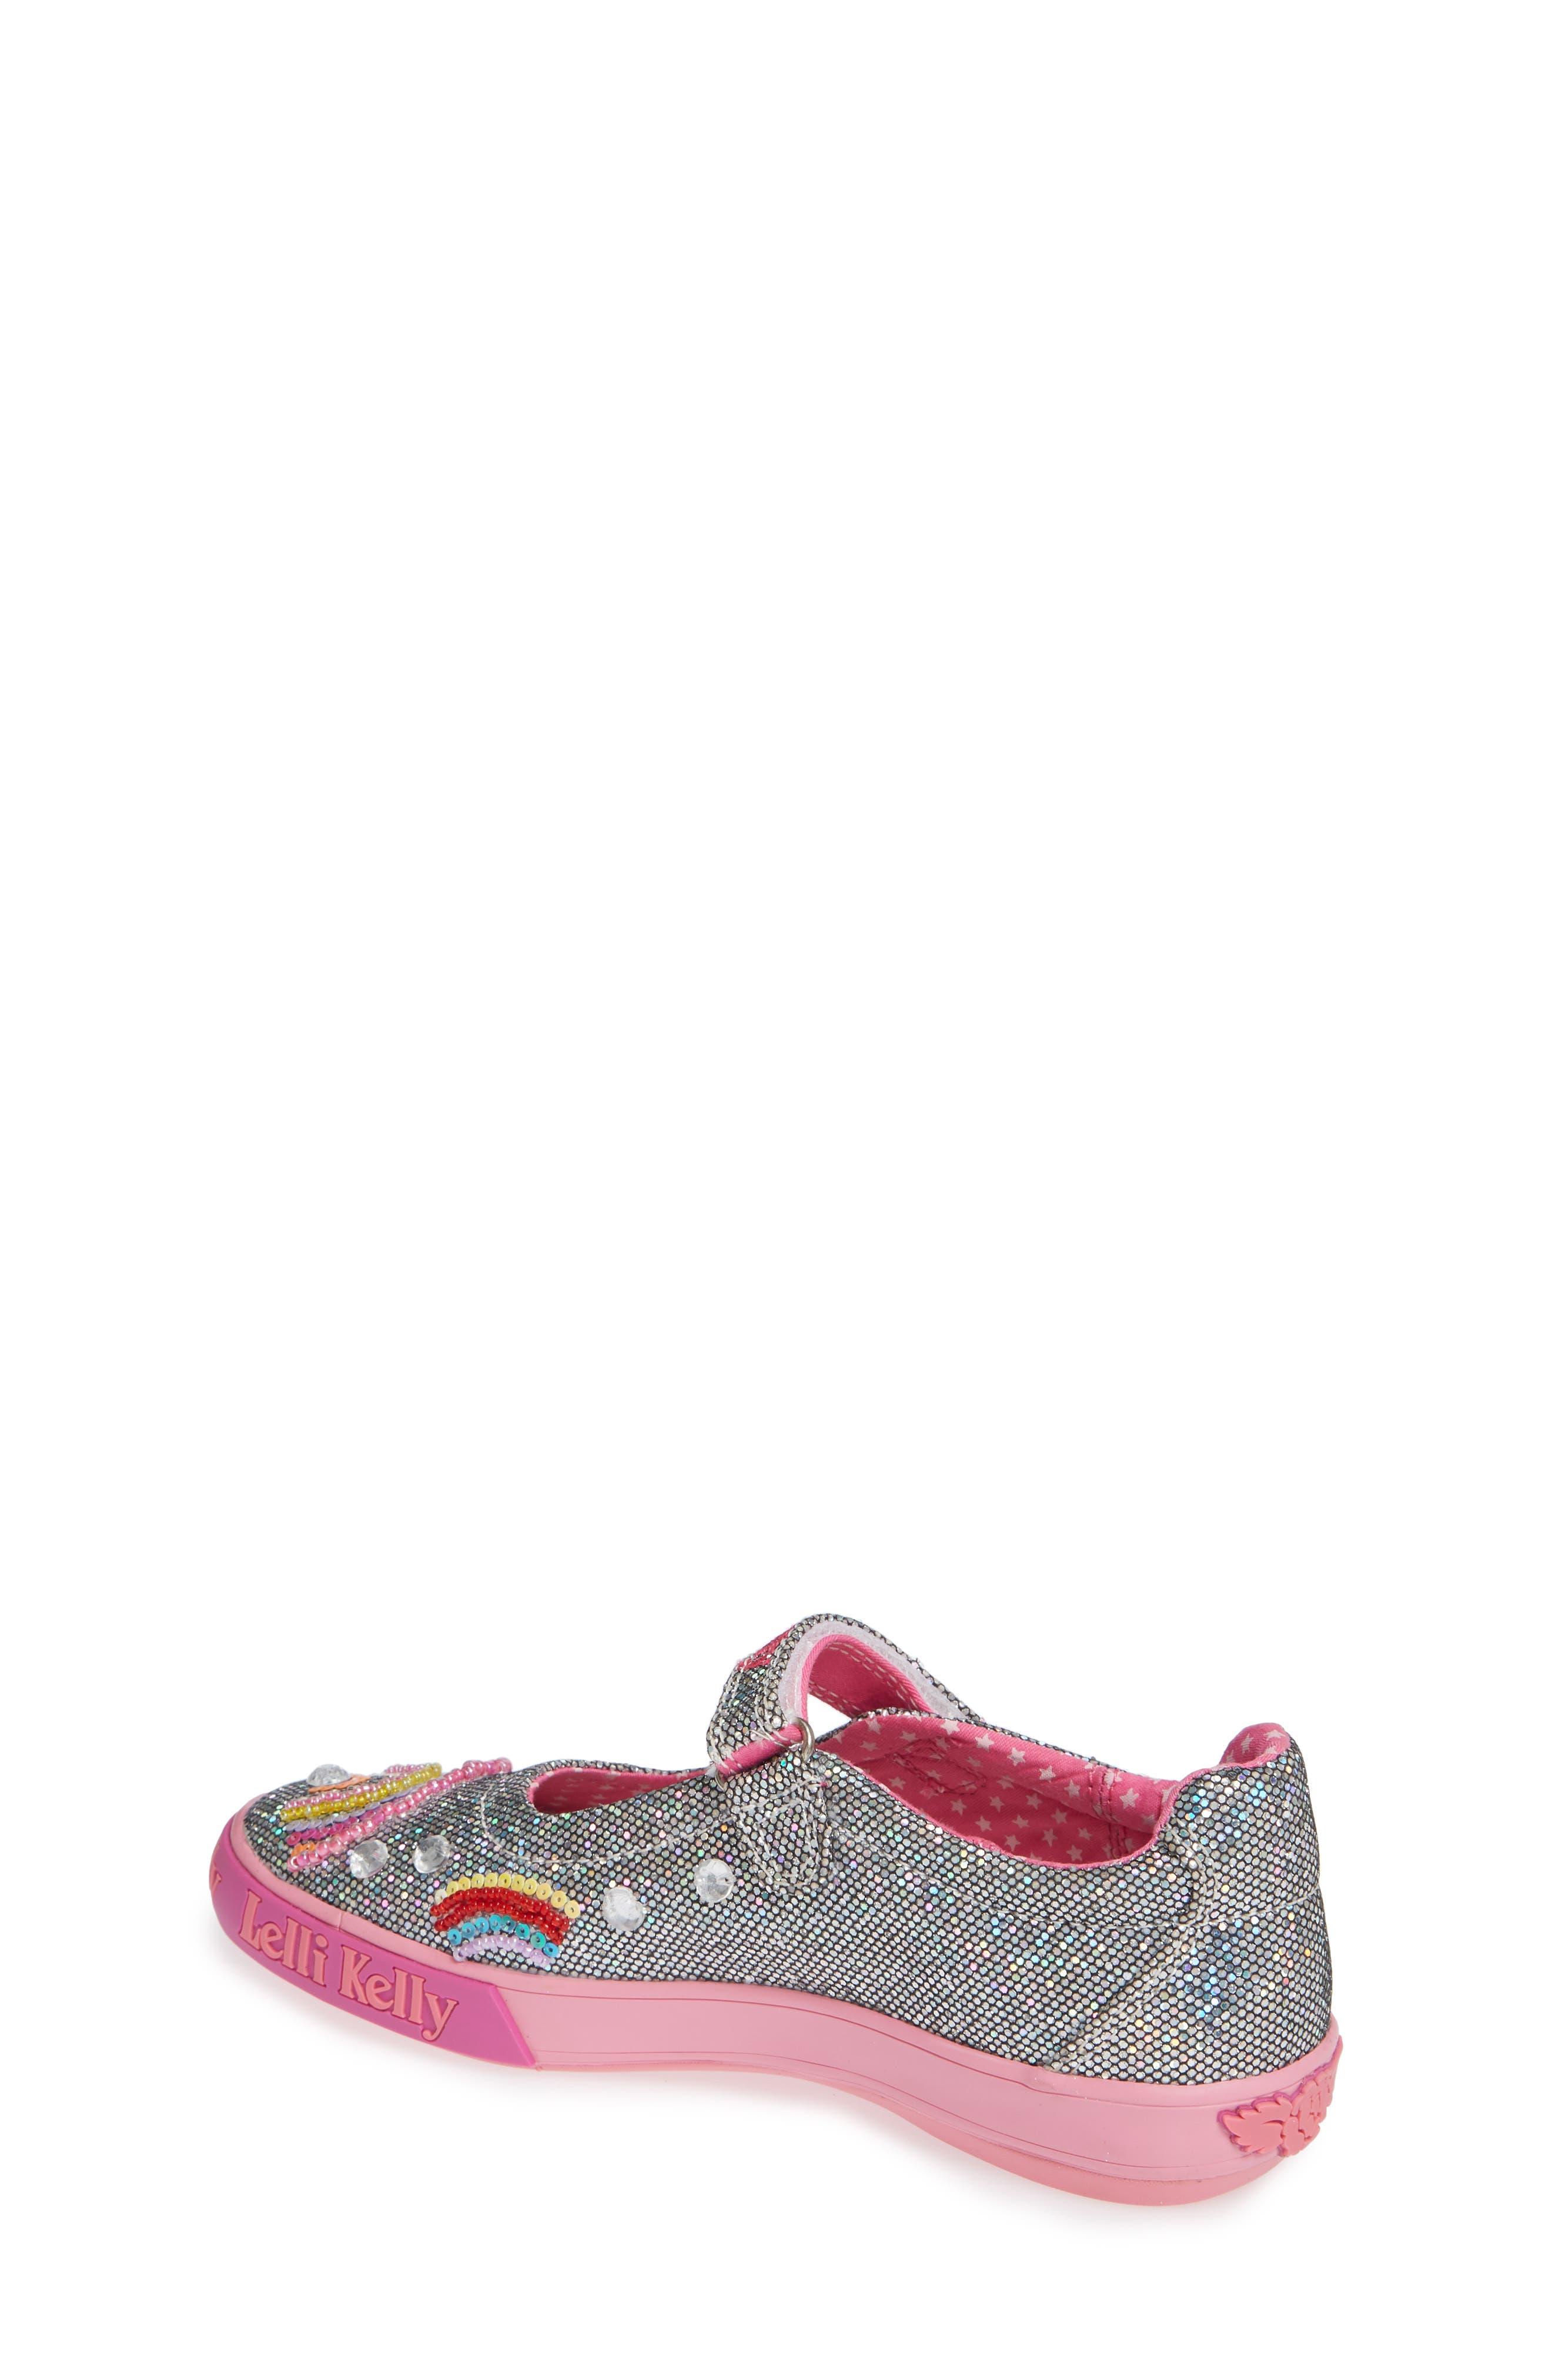 LELLI KELLY, Beaded Rainbow Mary Jane Sneaker, Alternate thumbnail 2, color, PEWTER